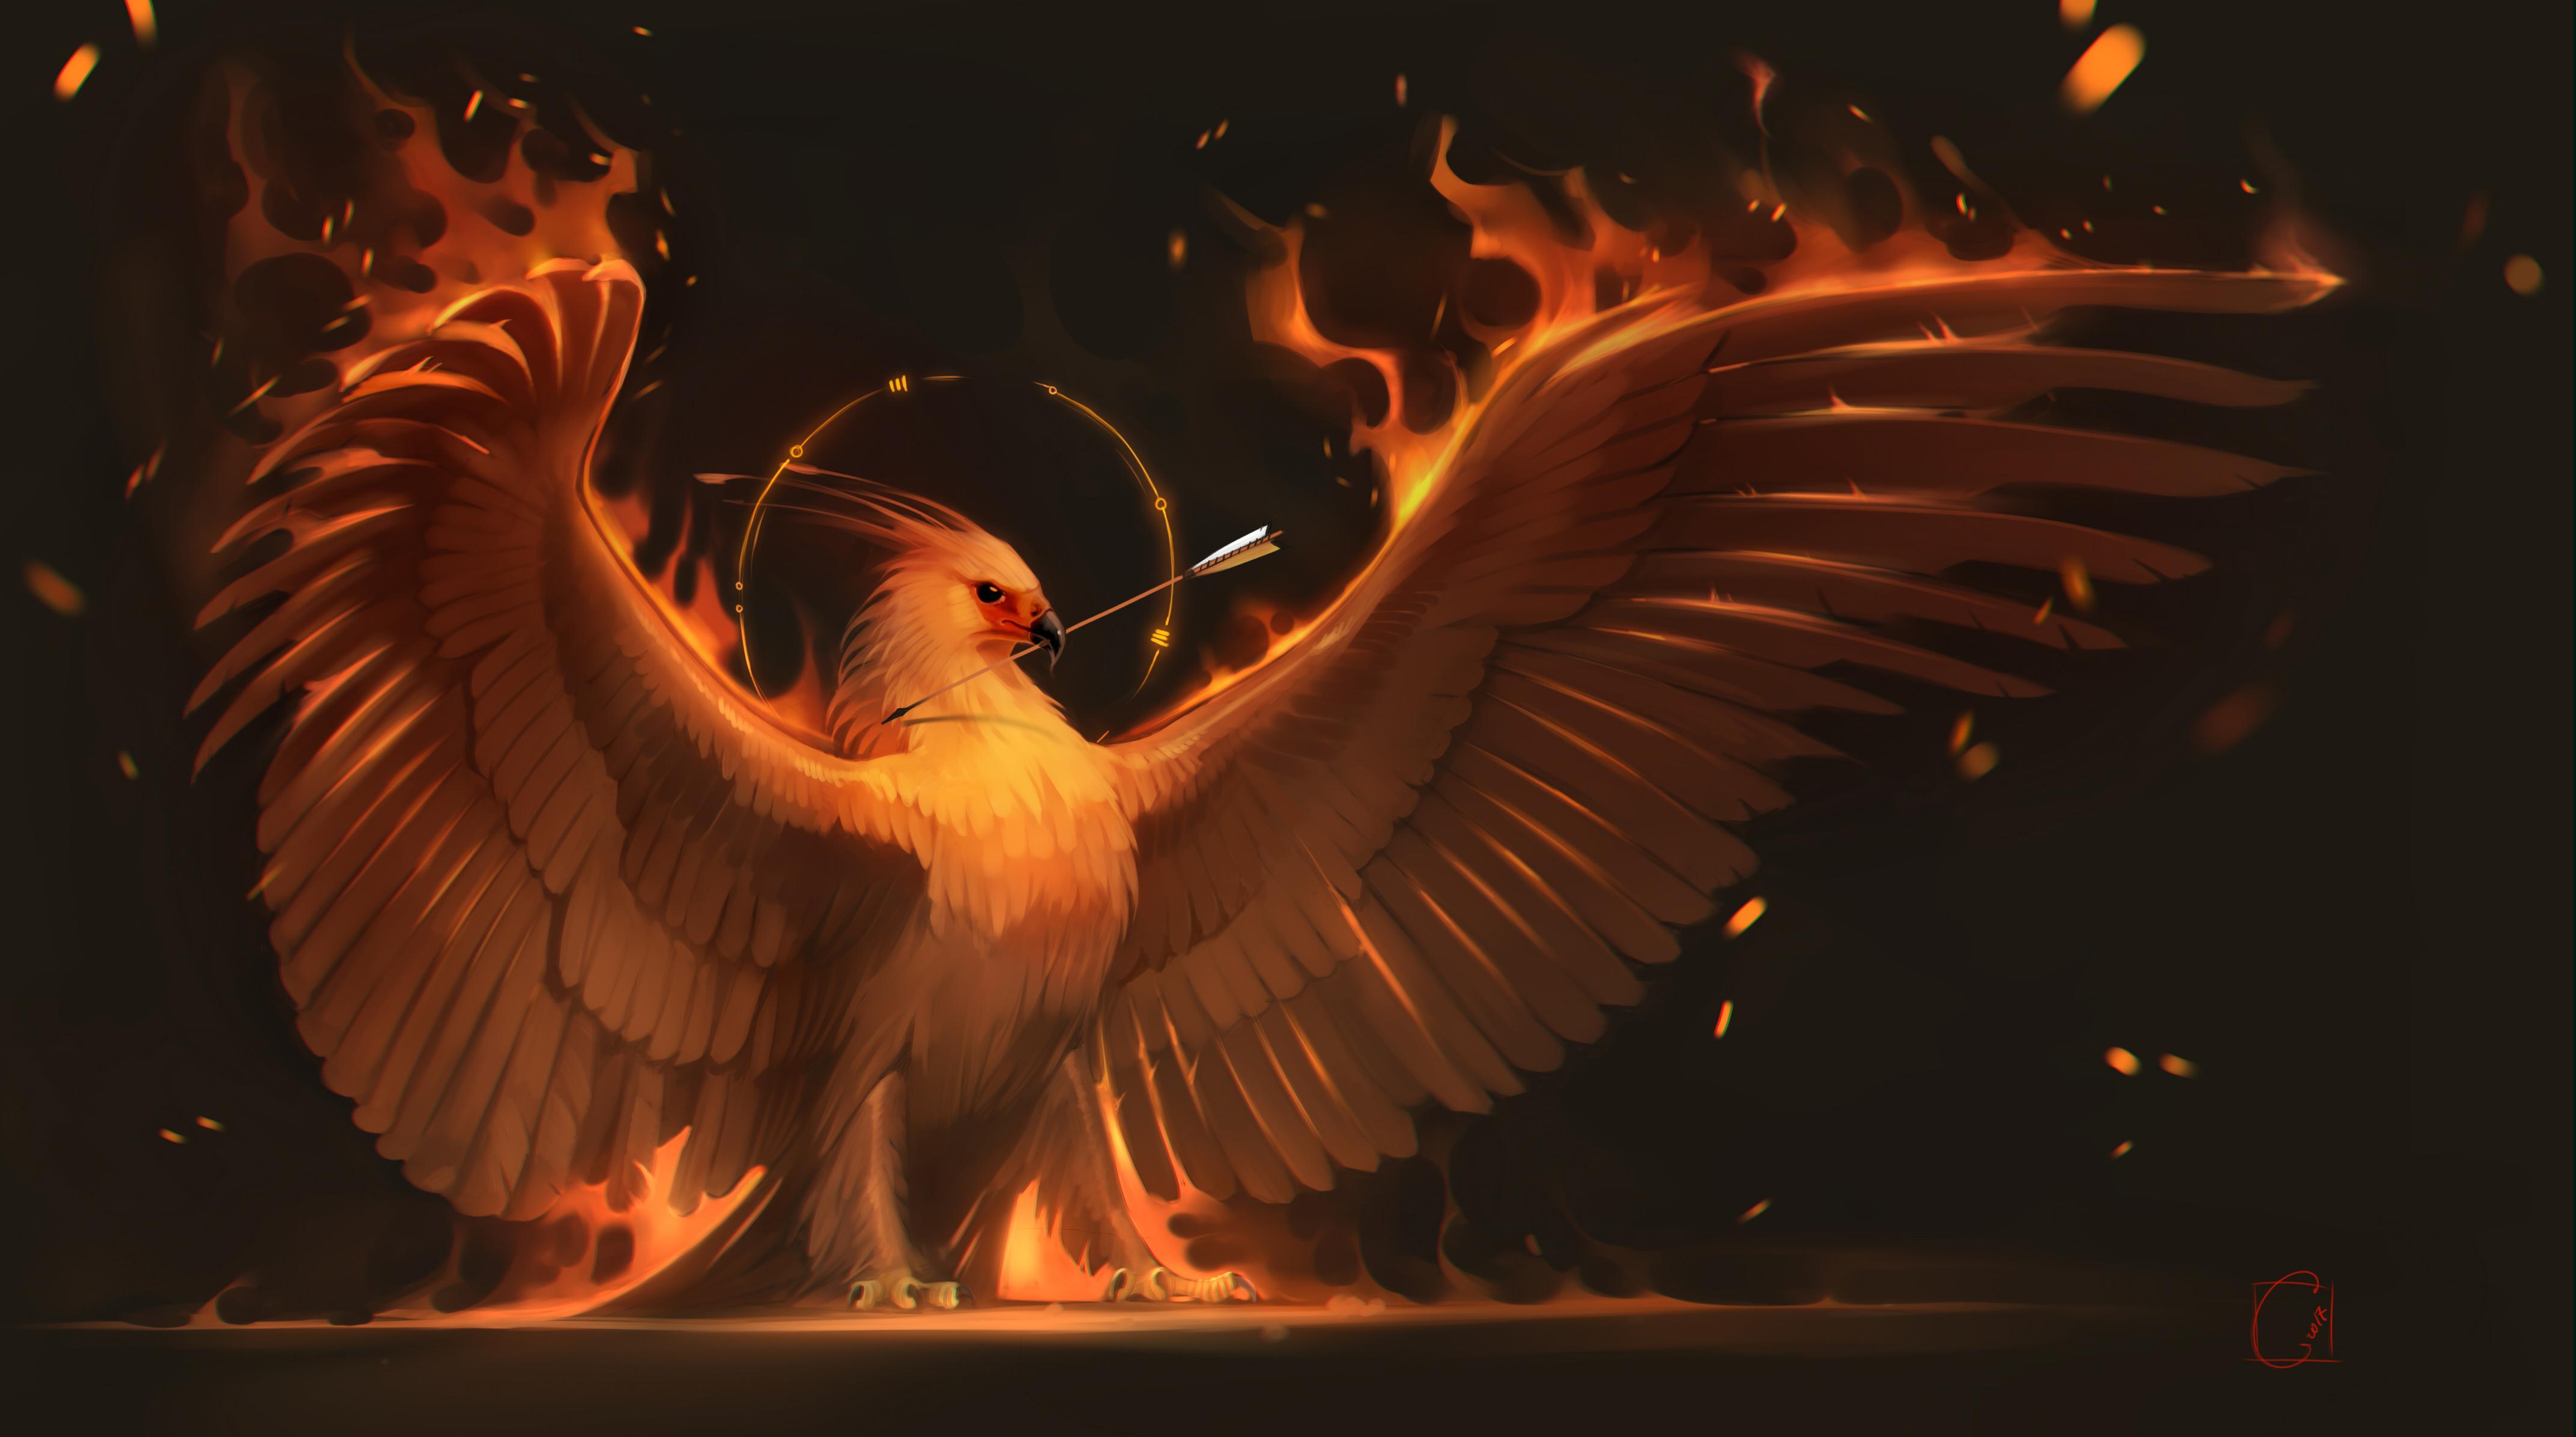 128536 4K Phoenix Creative Graphics wallpapers and 4289x2392